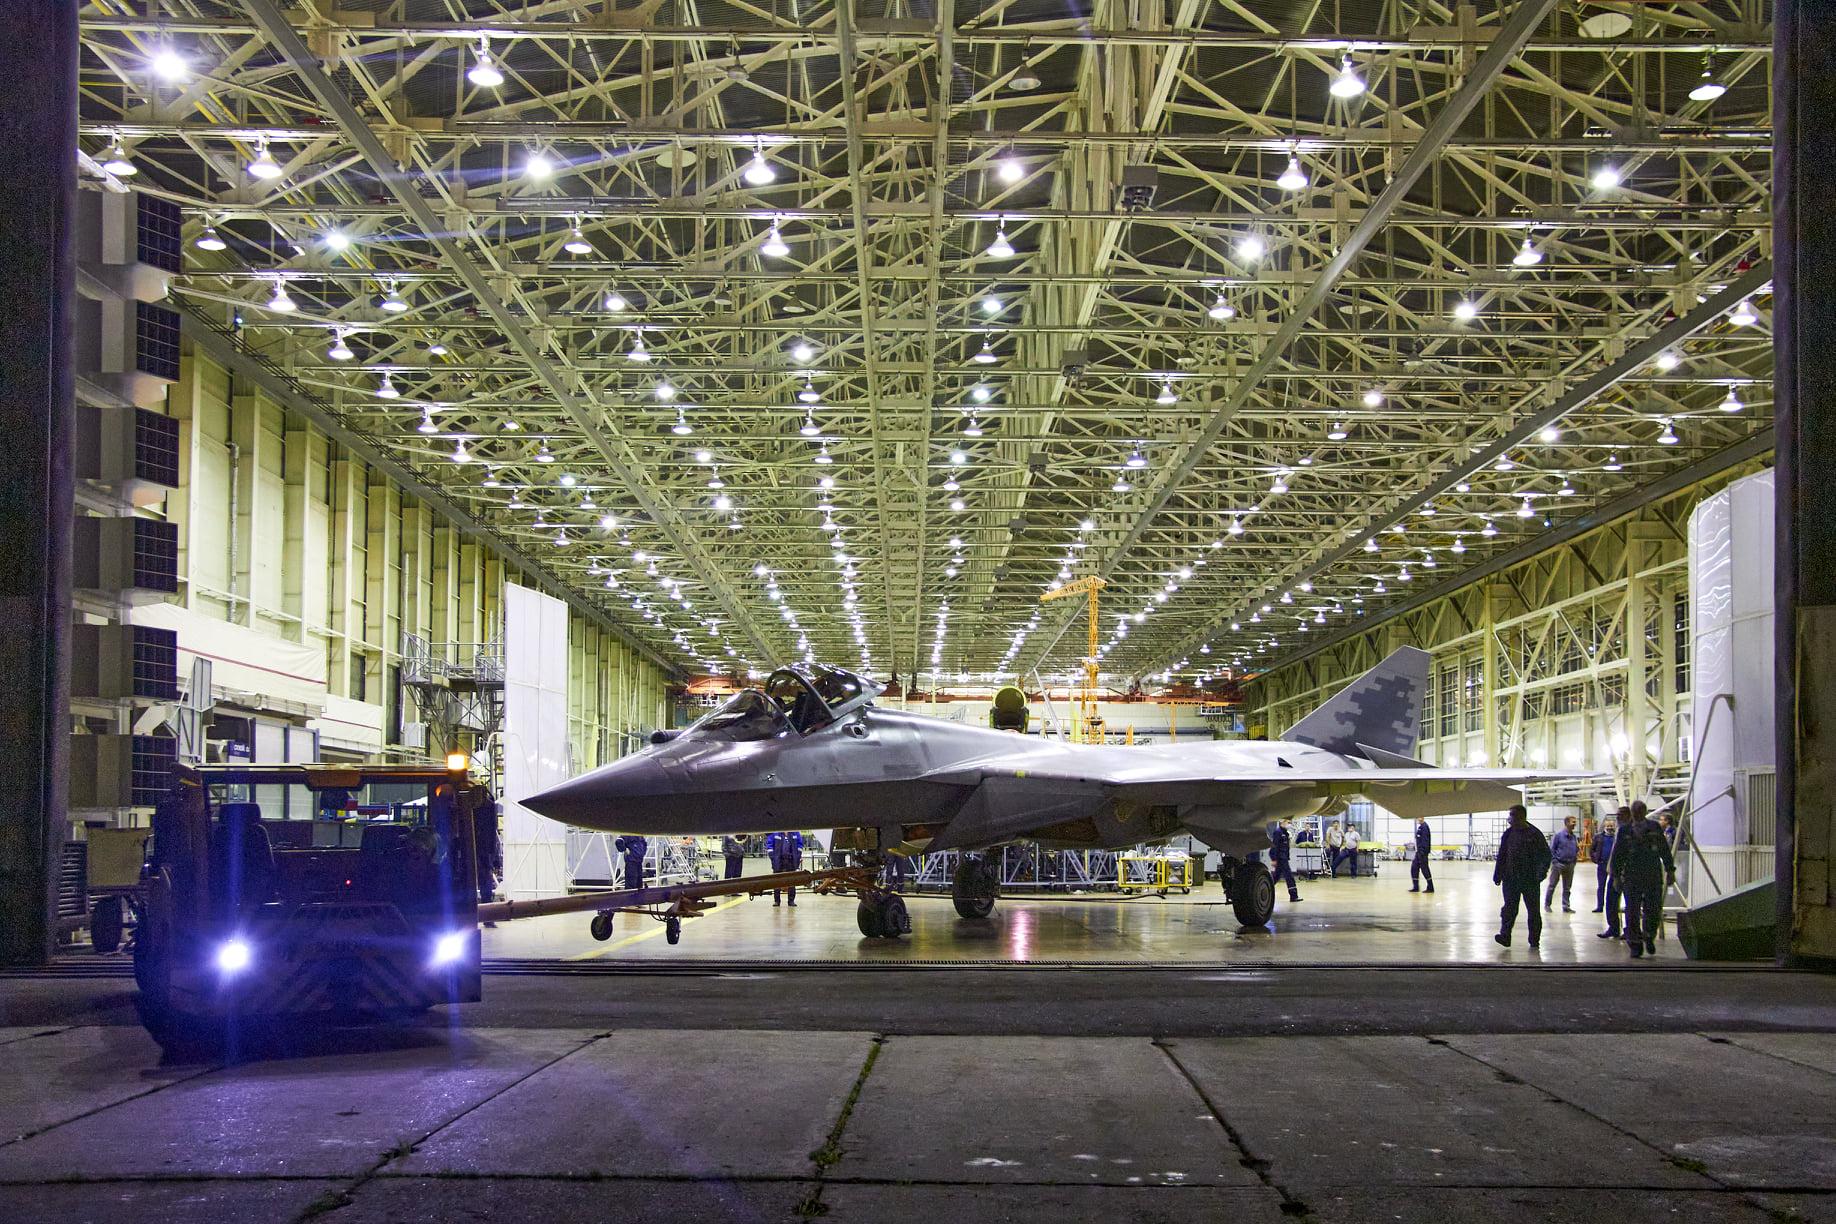 Разработка модернизированного варианта истребителя Су-57 230897898_4861012327247311_4382497169643480490_n